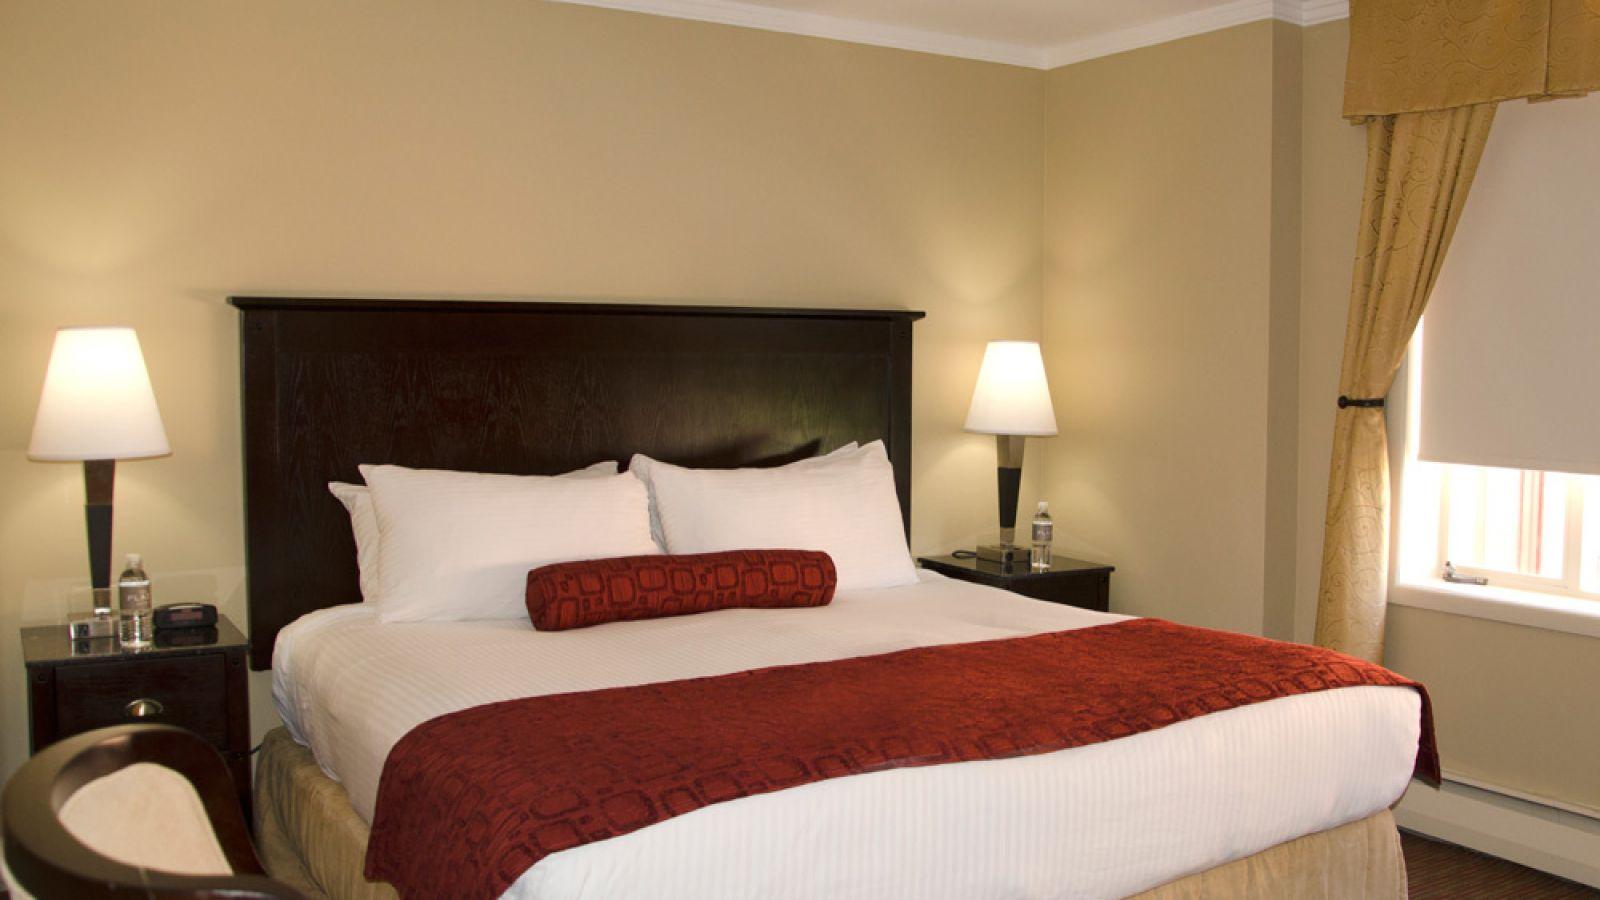 Plaza Hotel Kamloops - Standard King room